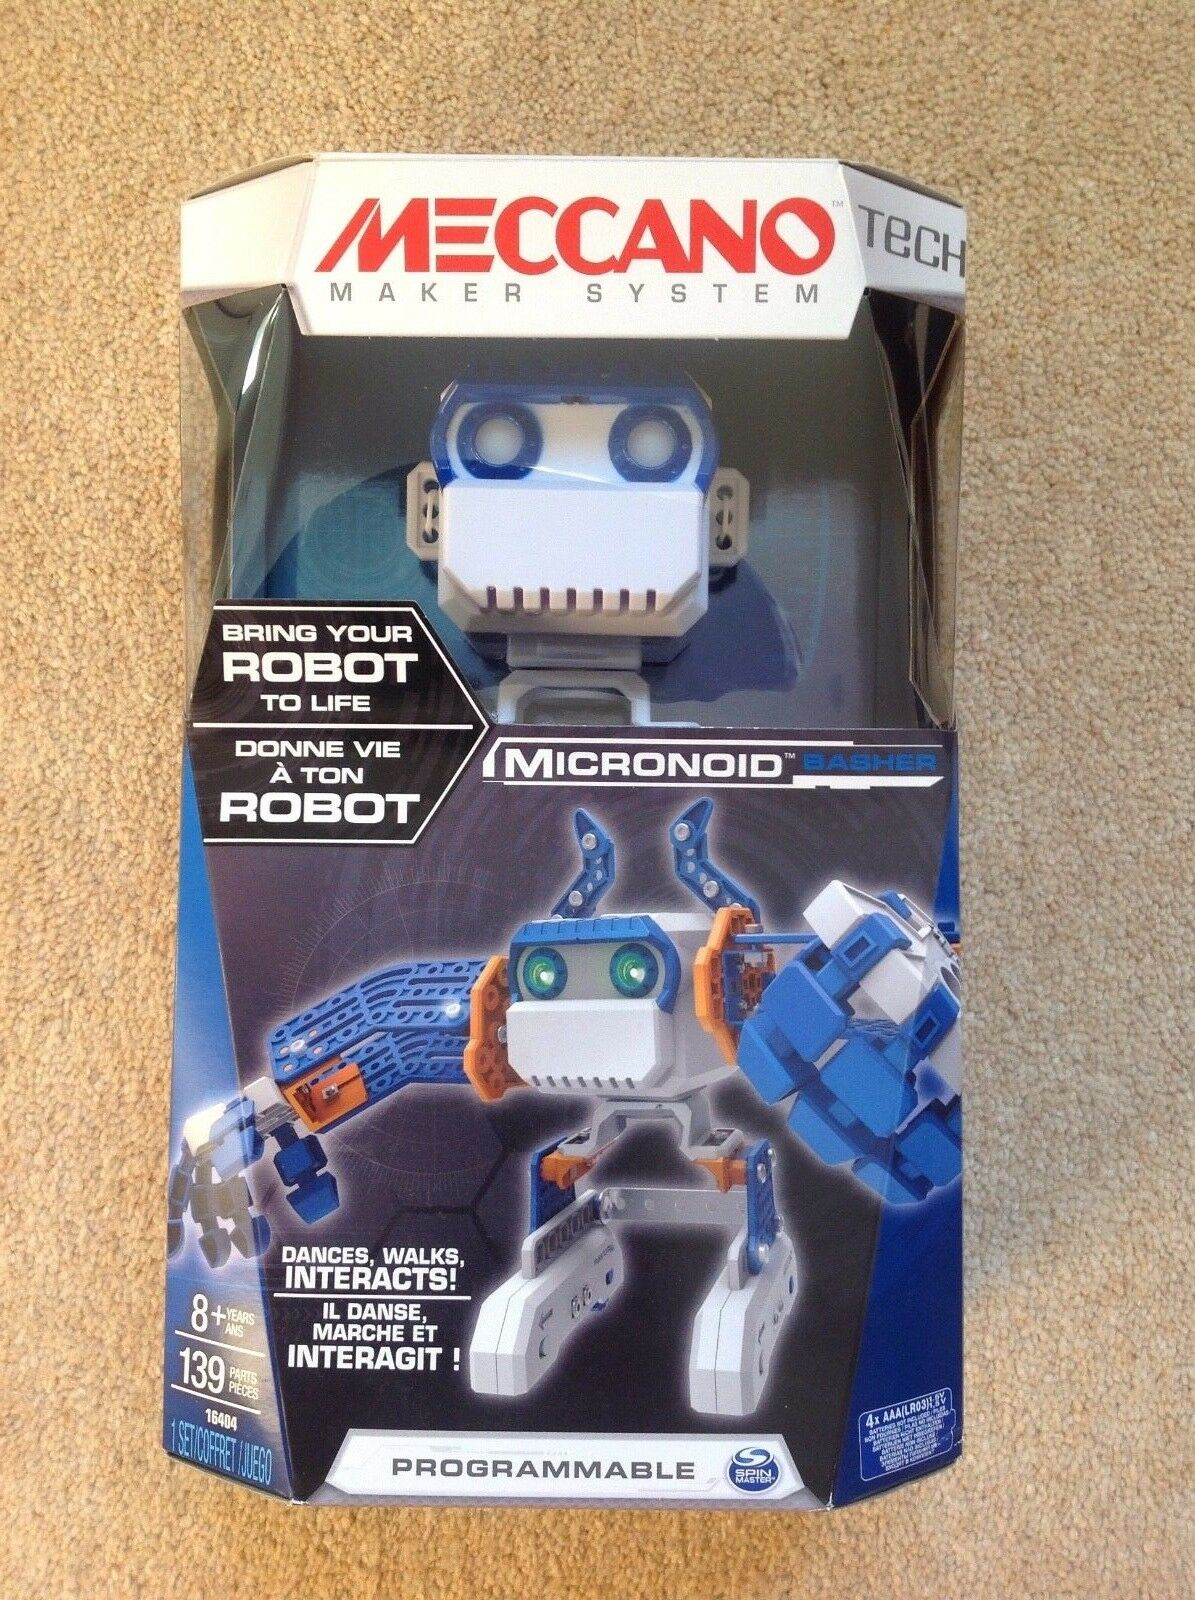 Meccano Micronoid bluee Basher Programmable Interactive Robot BNIB